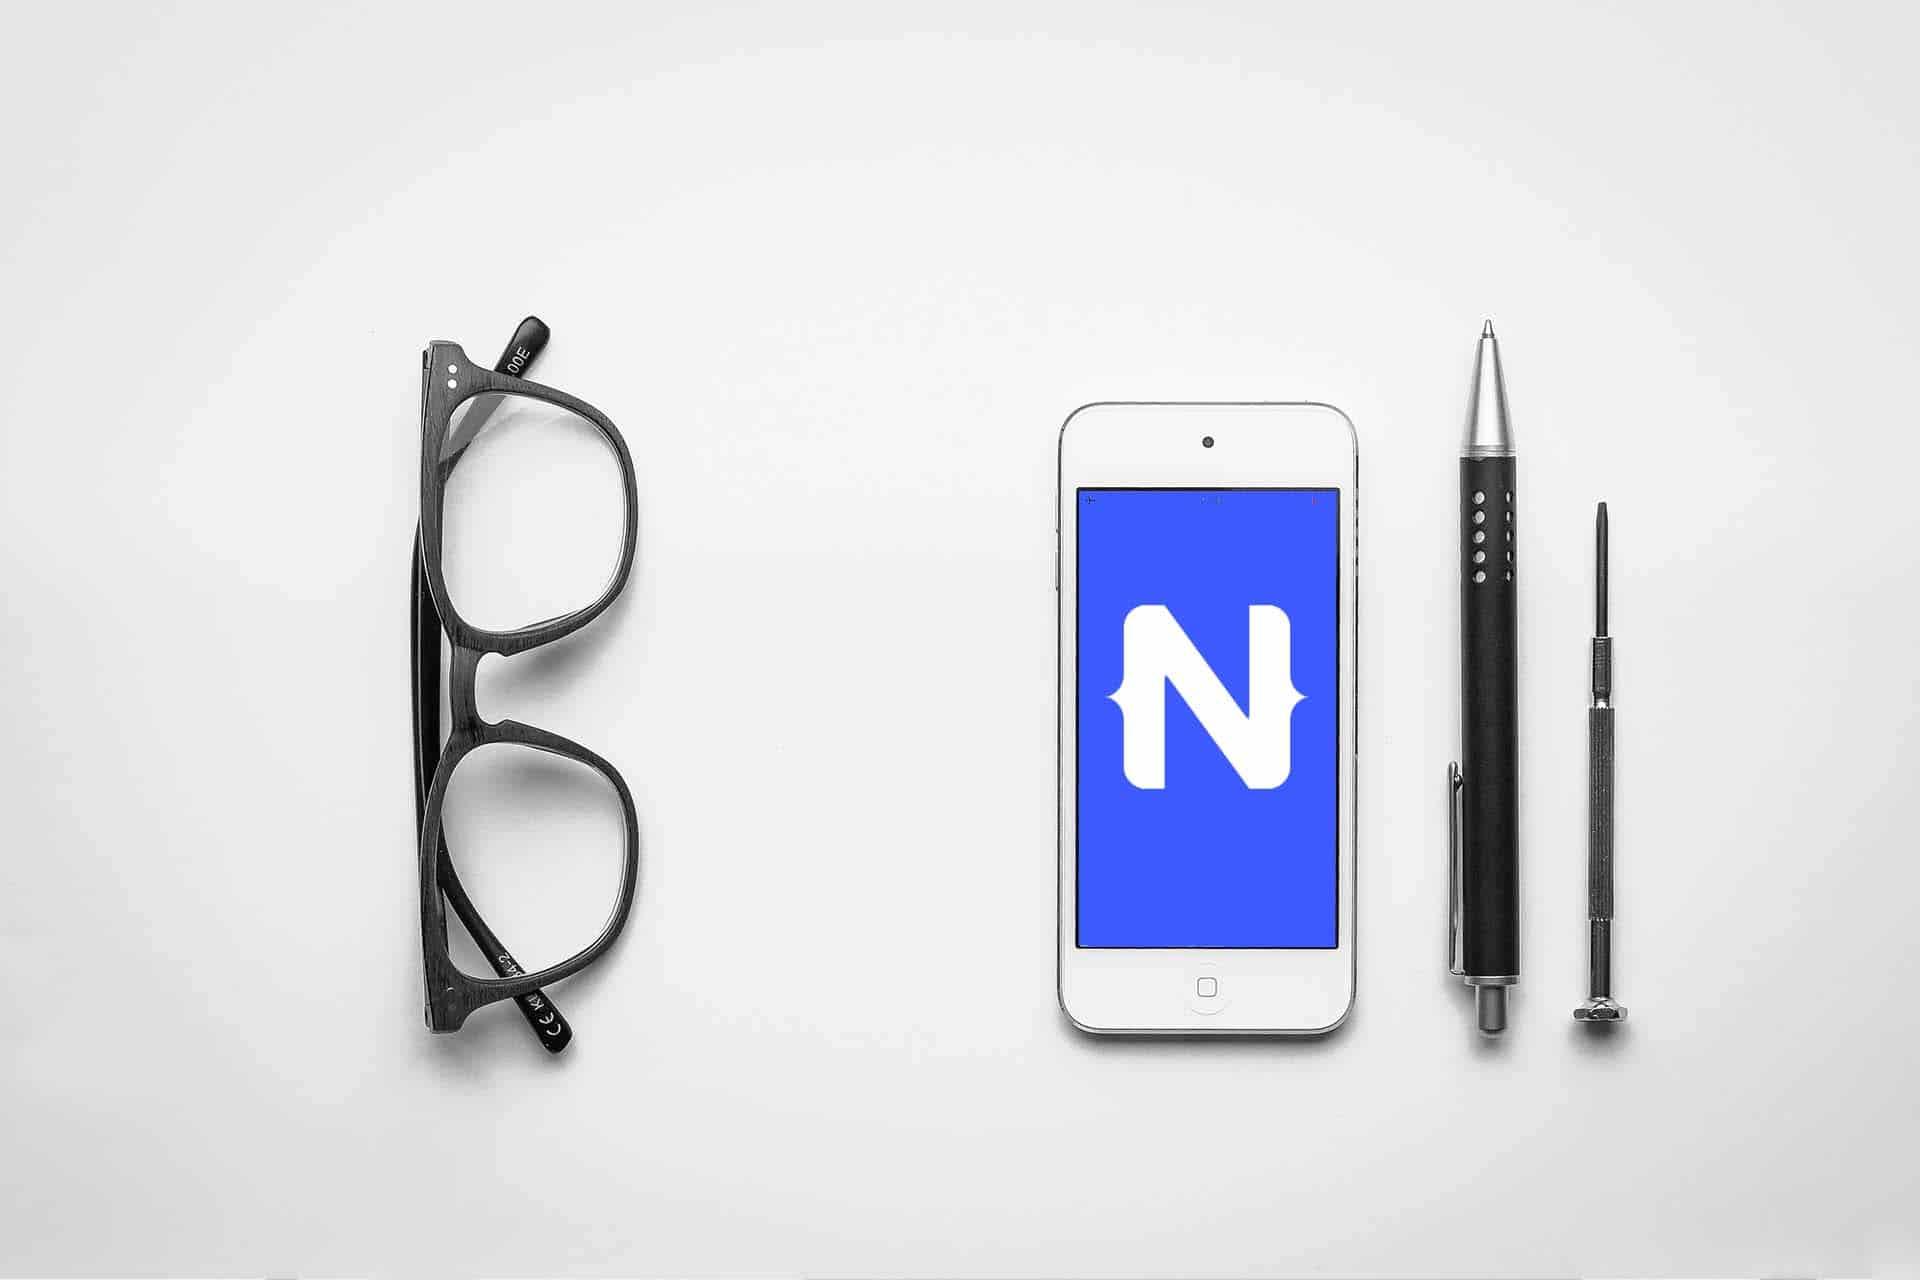 t2informatik Blog: App-Entwicklung mit NativeScript